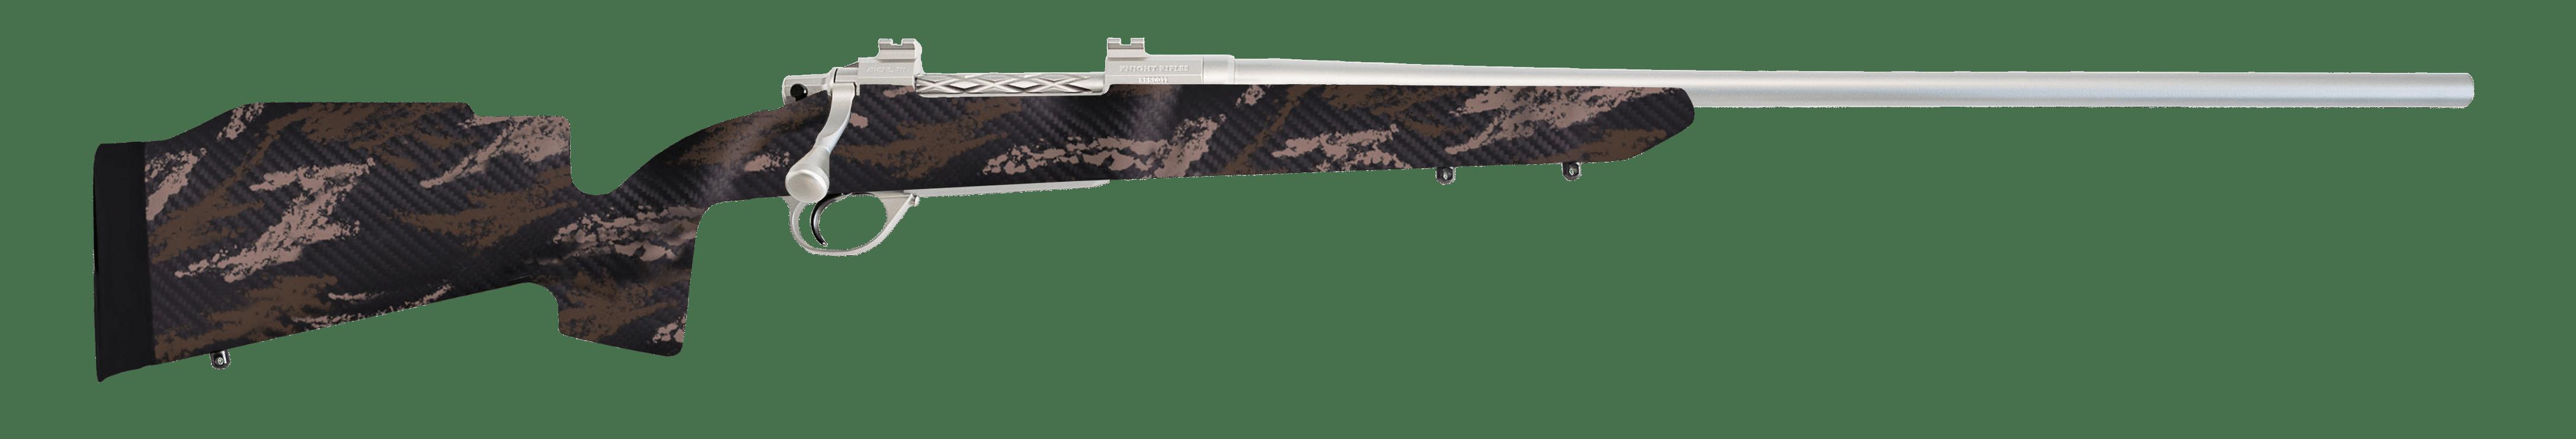 Certatus-Rifle_Final-1